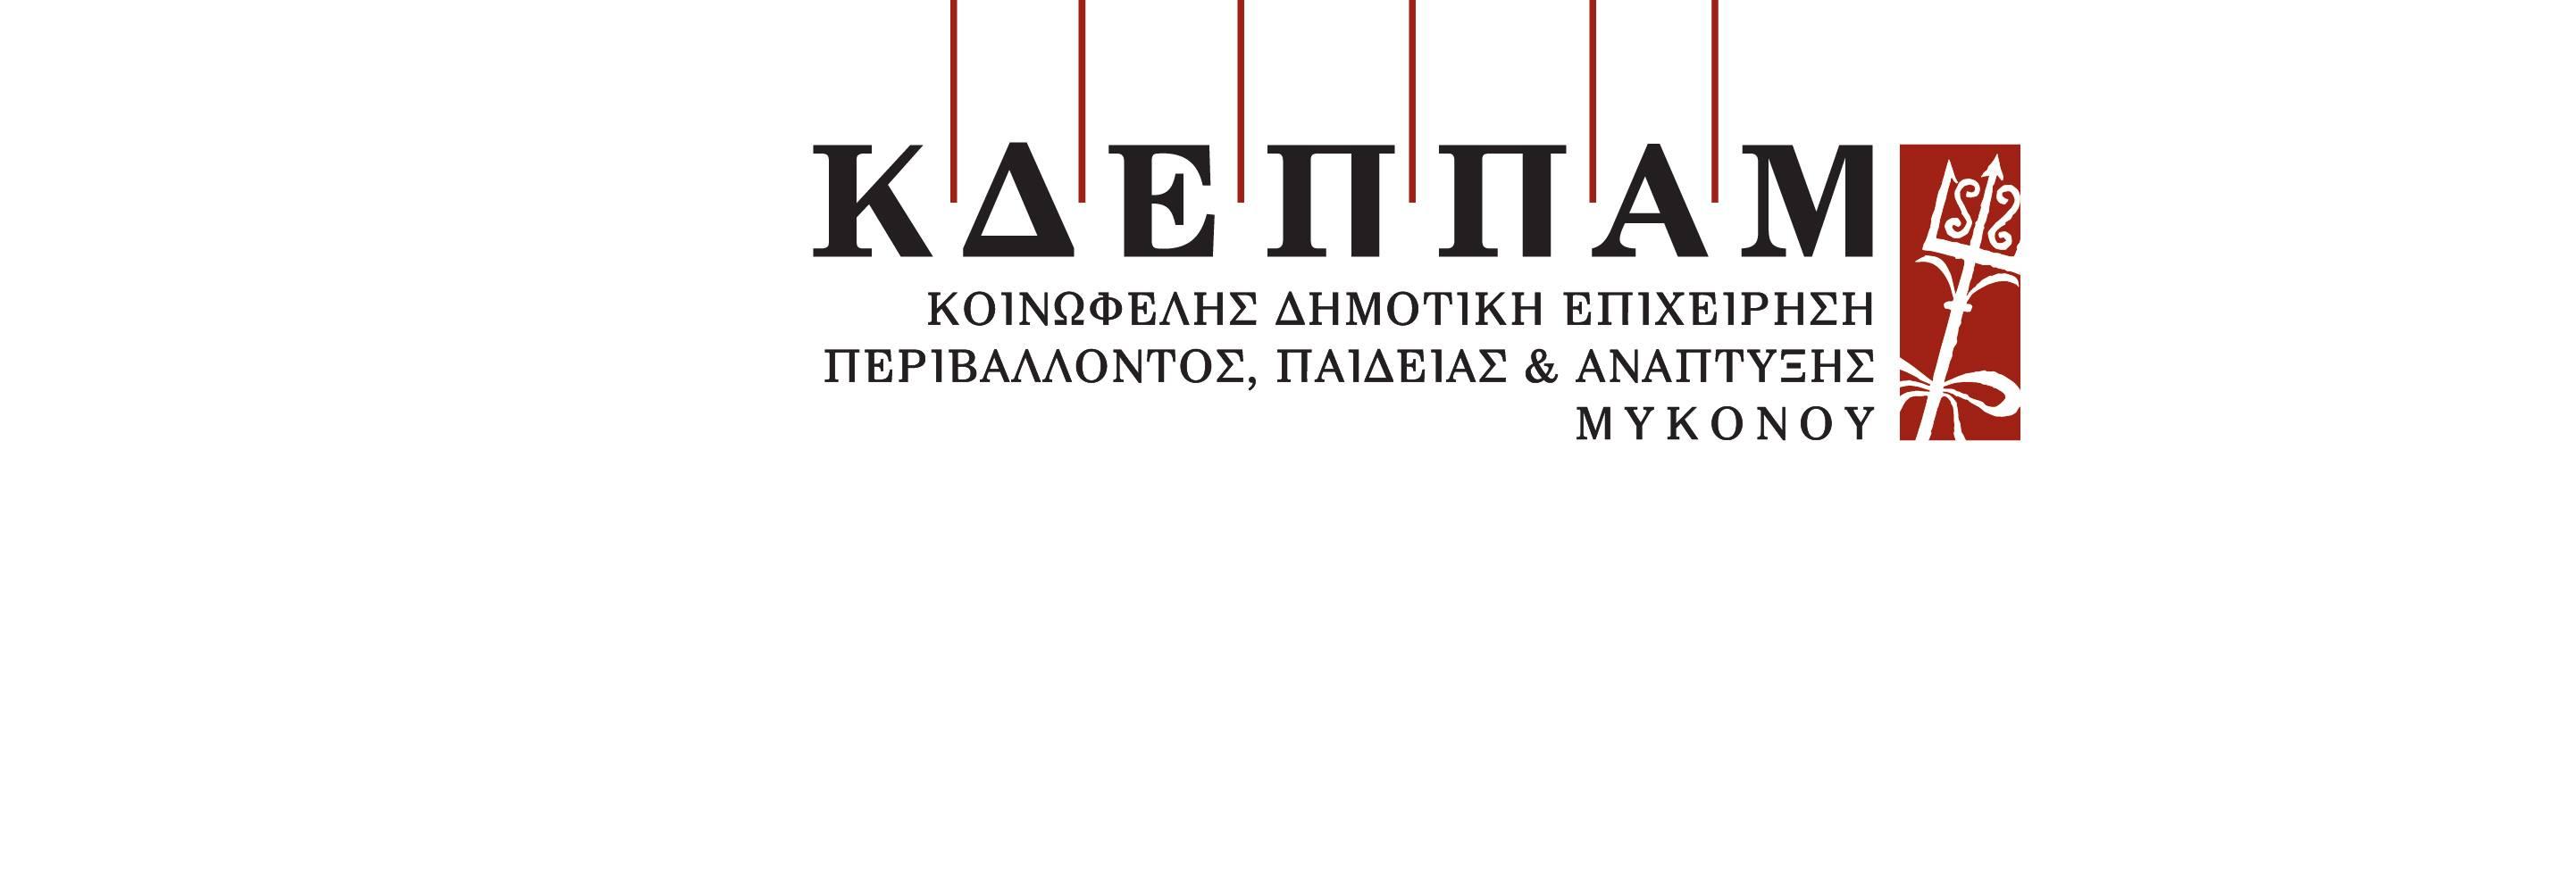 08/20(August 20) Giannis Kotsiras and Mirela Pachu